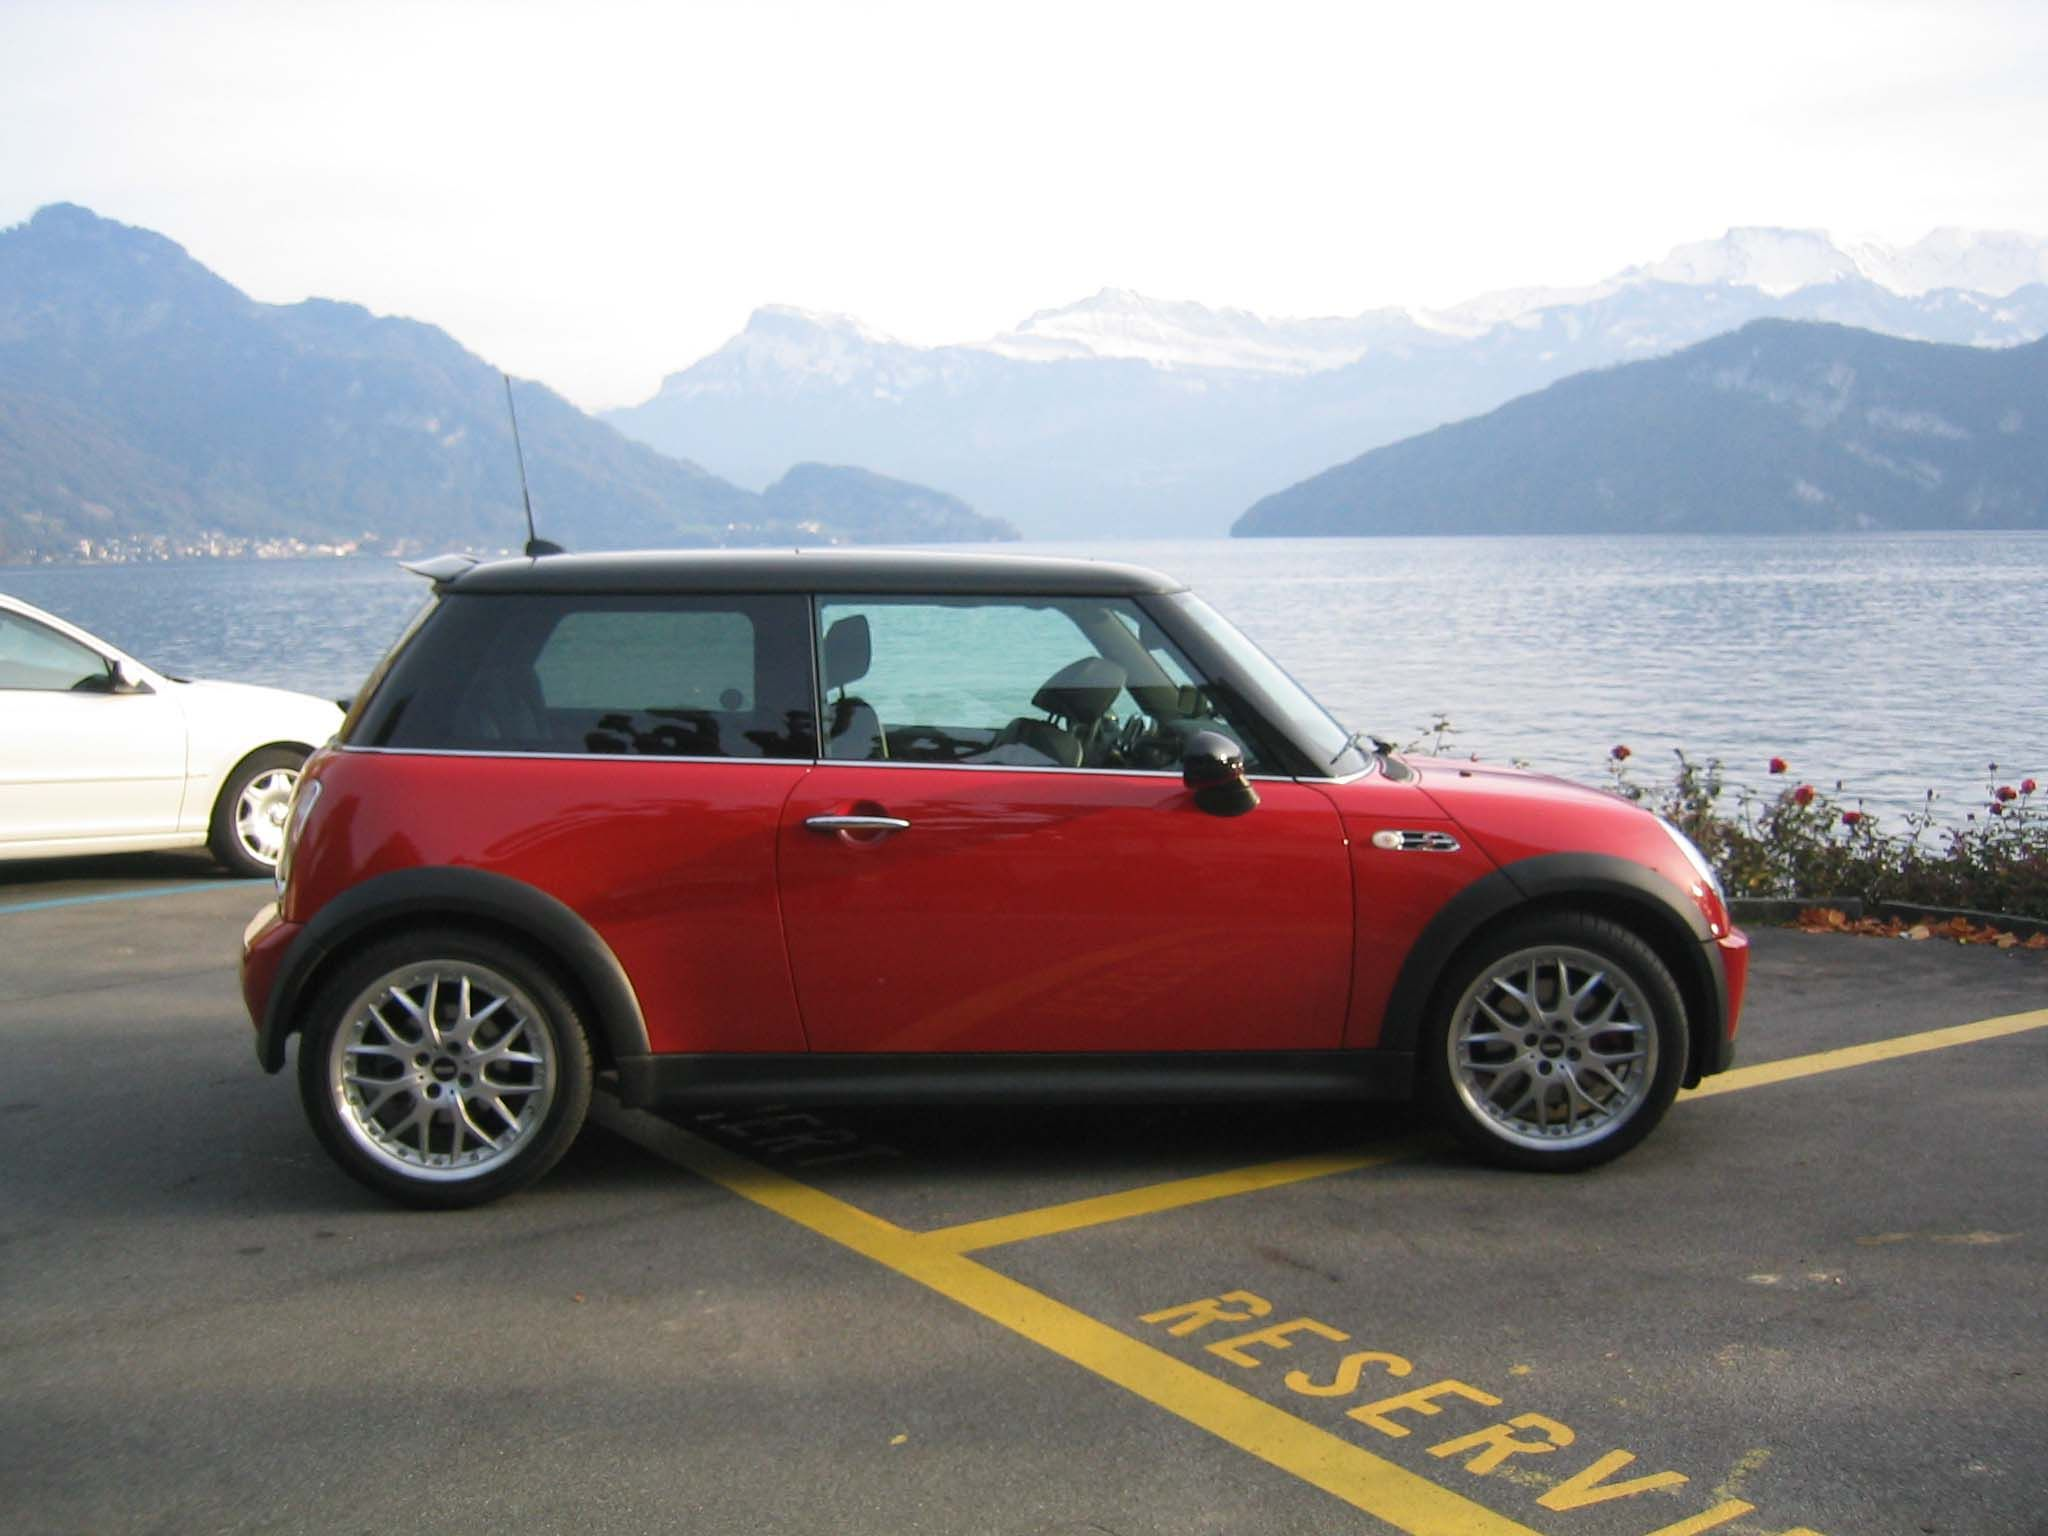 bbs lm | MINI alloys | Pinterest | Minis, Cars and Wheels